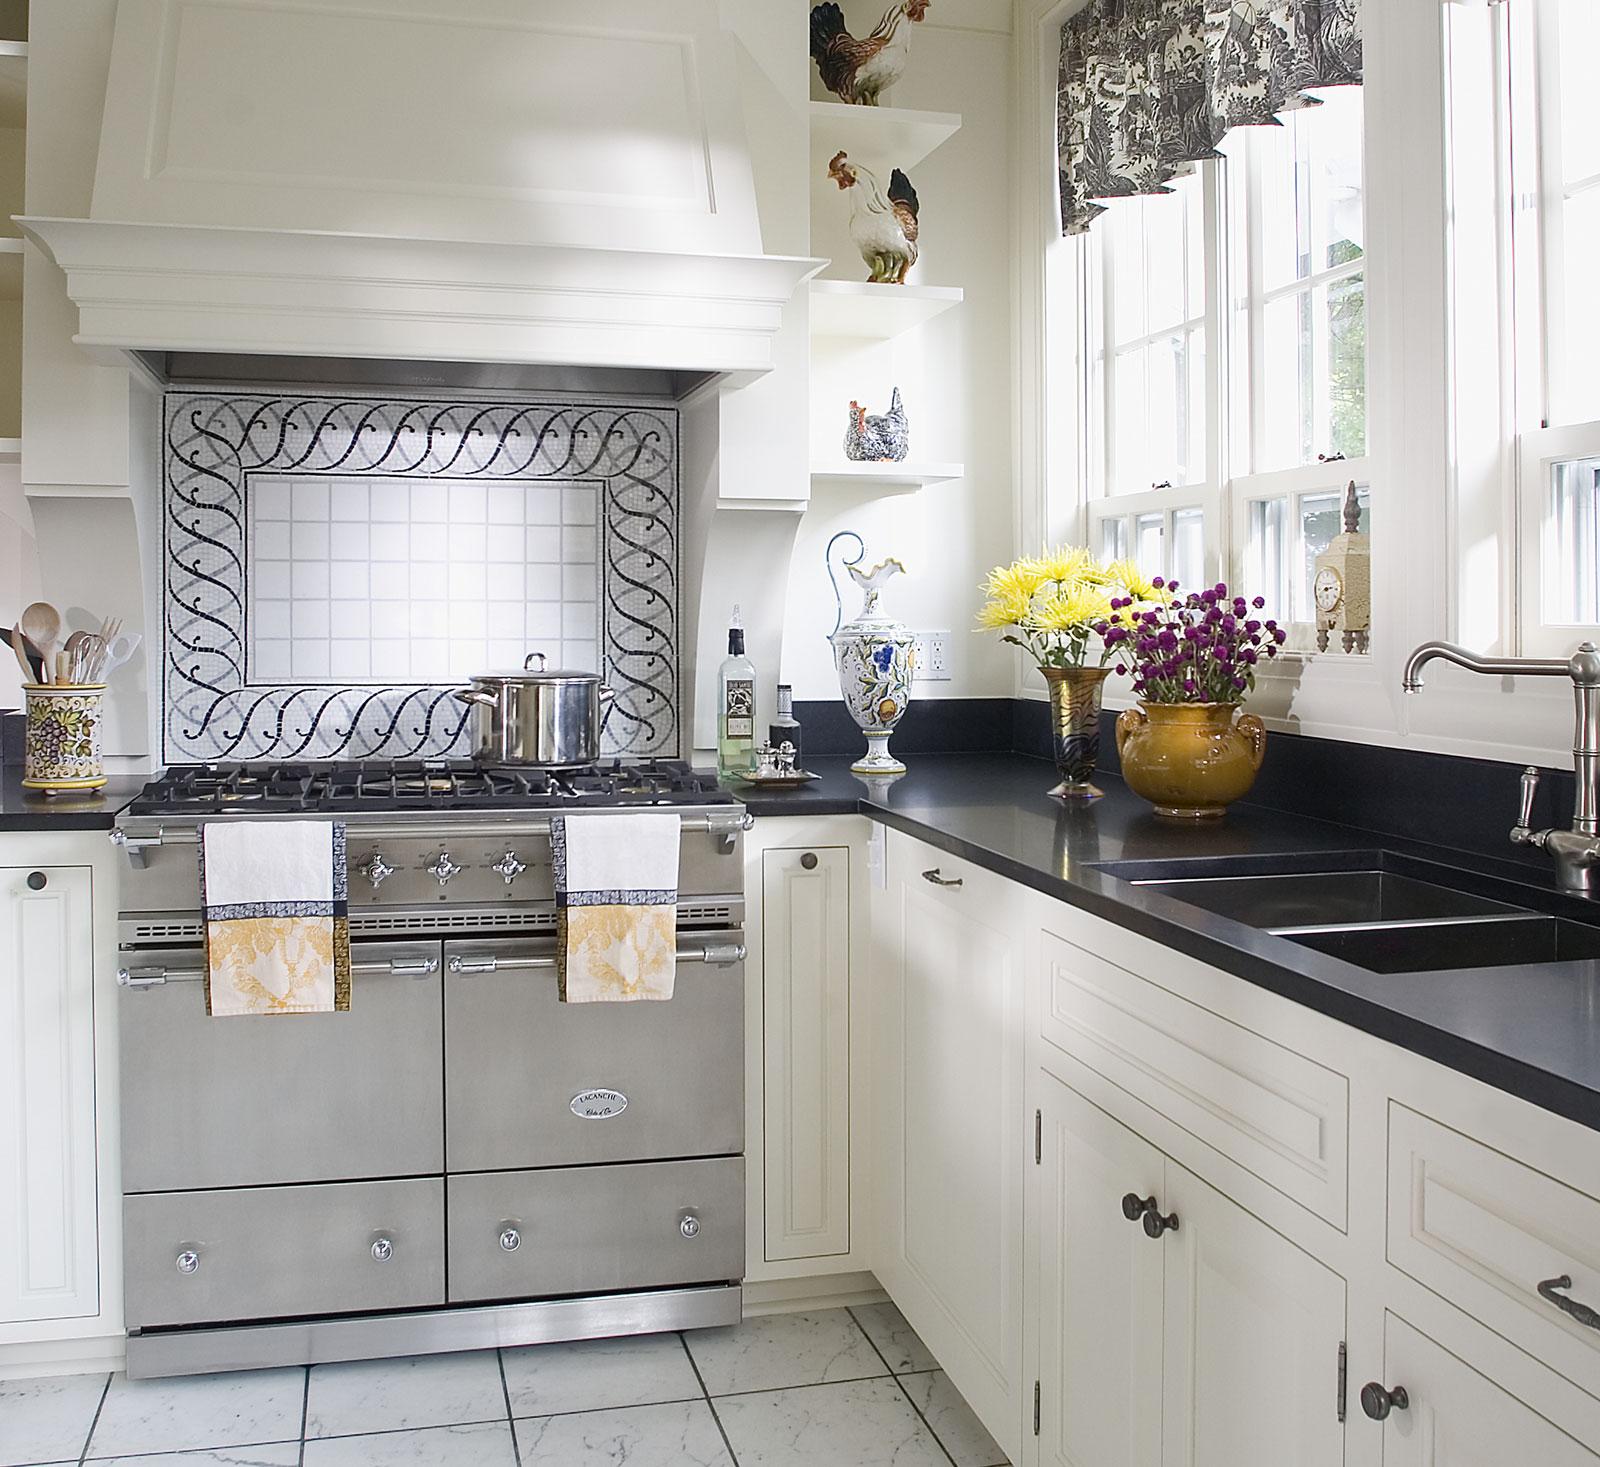 19 how to install kitchen backsplash video bathroom remodel